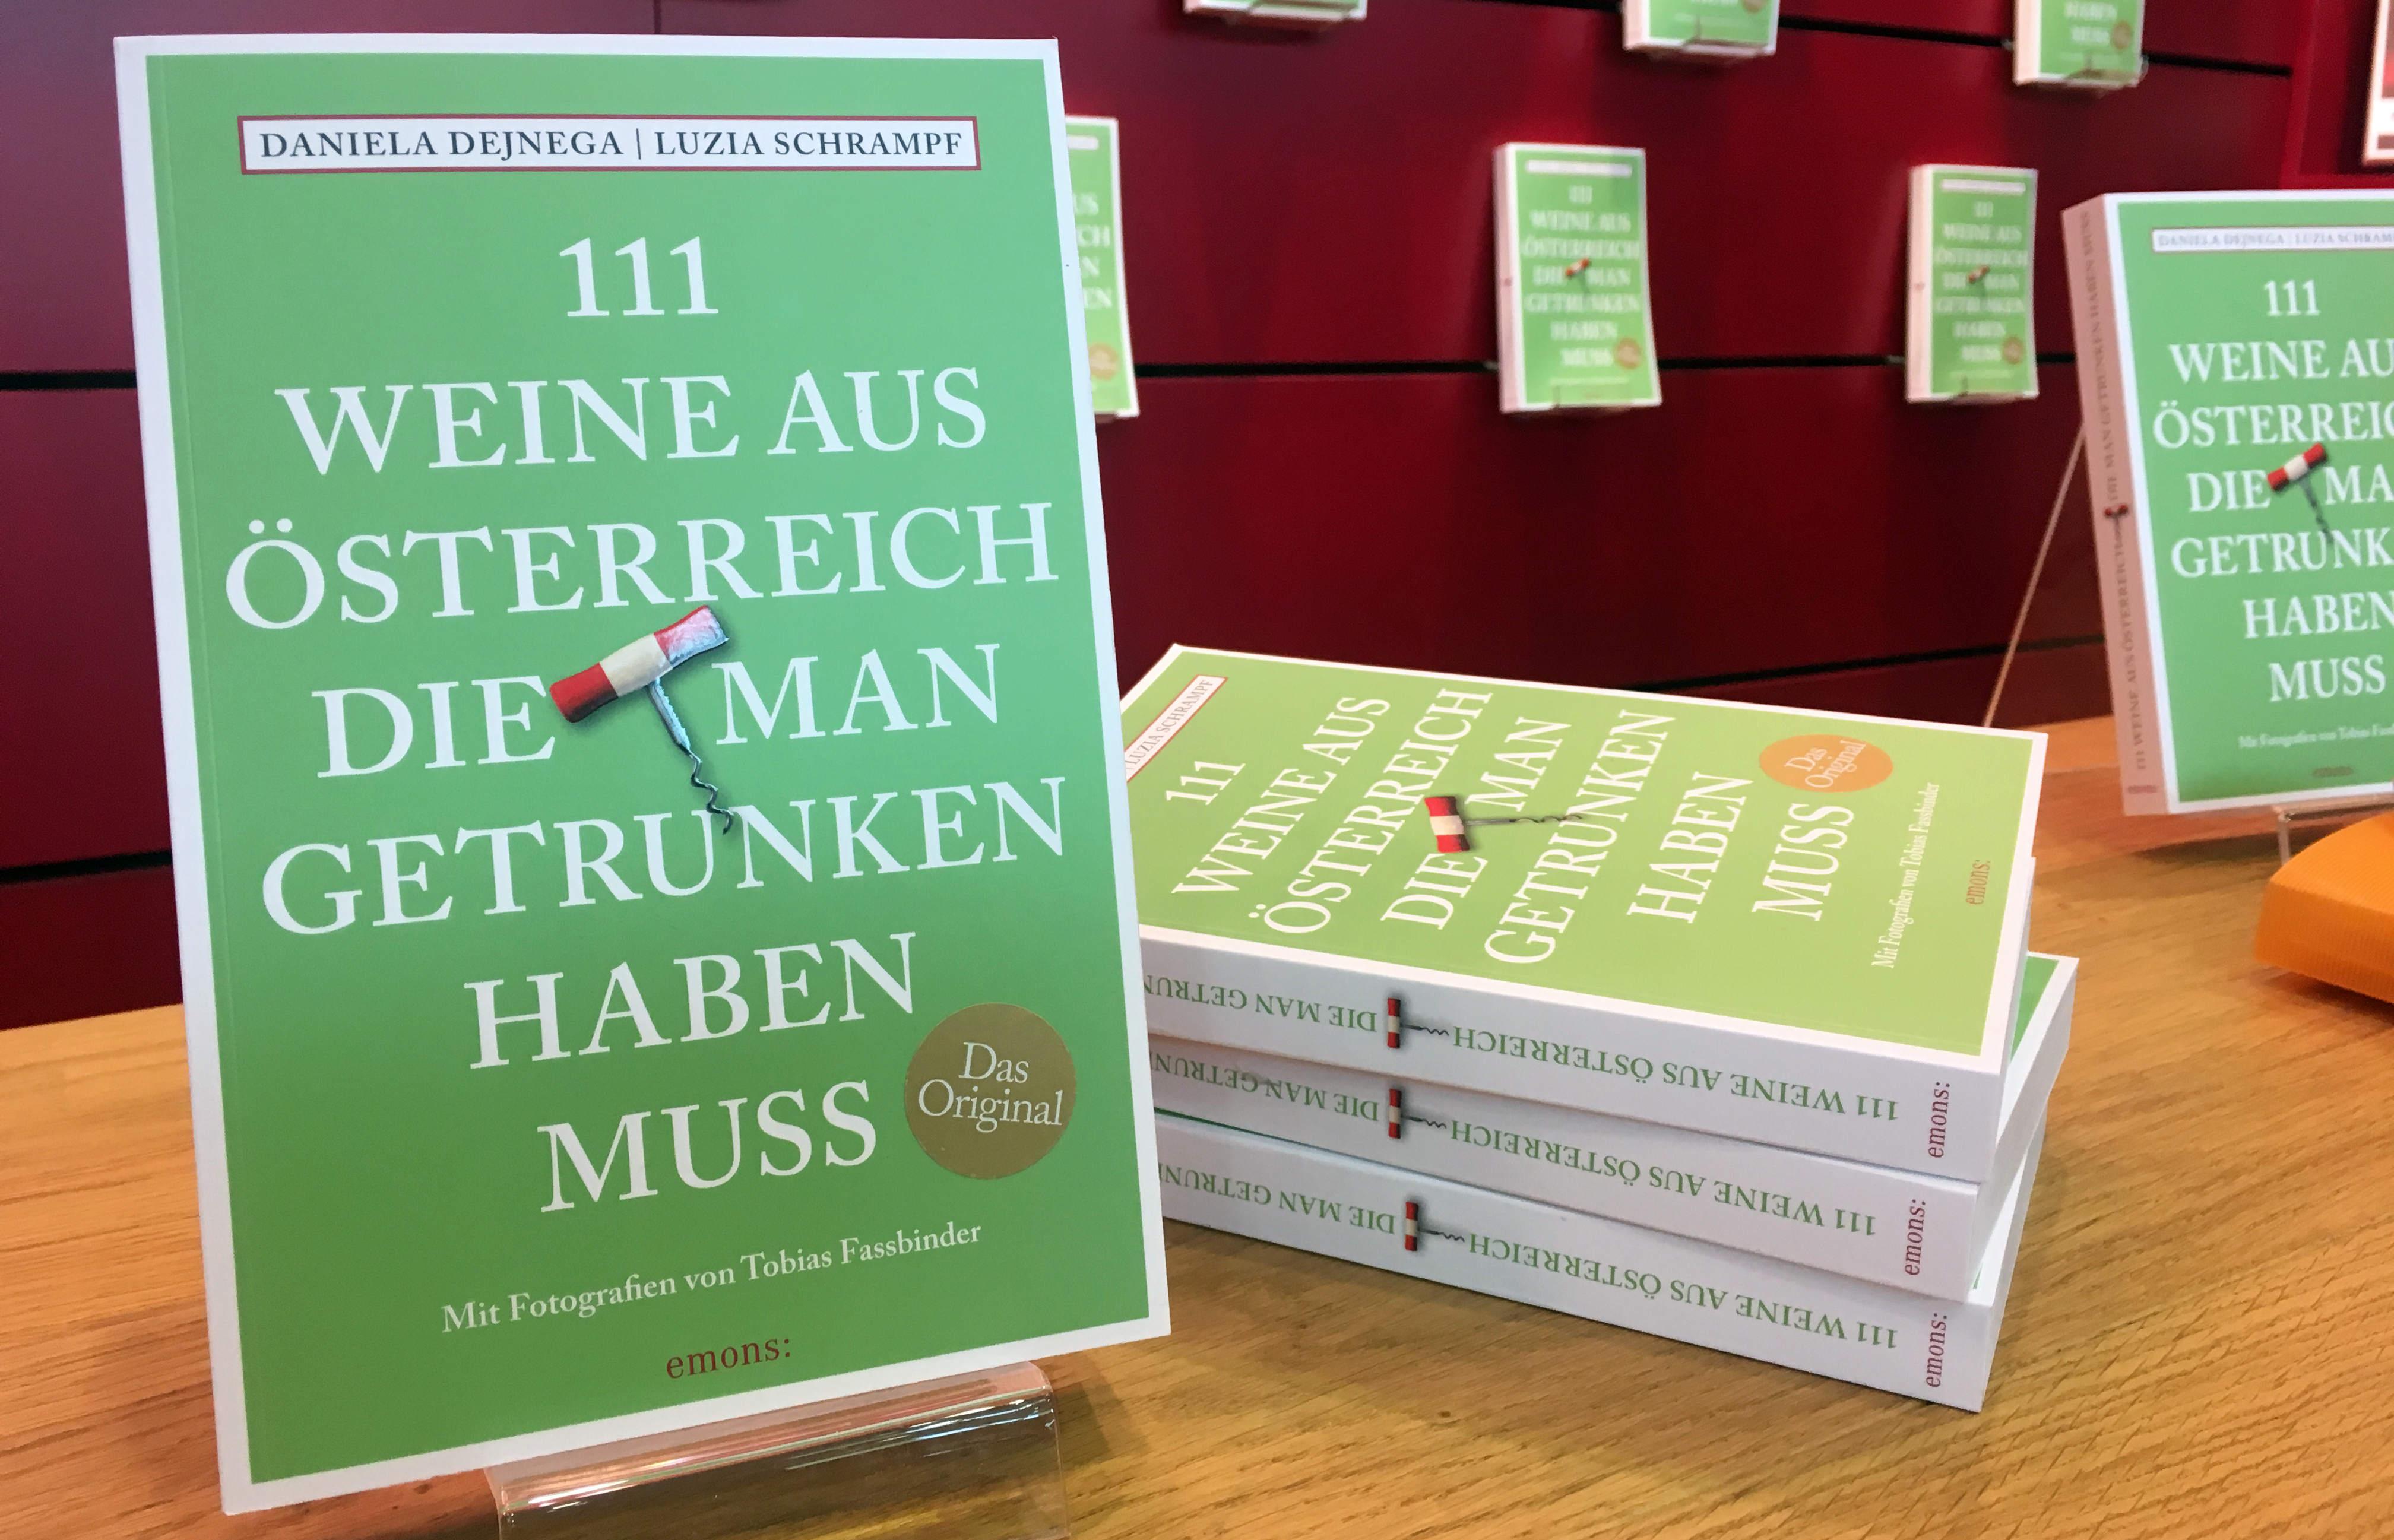 Frankfurter Buchmesse © Daniela Dejnega